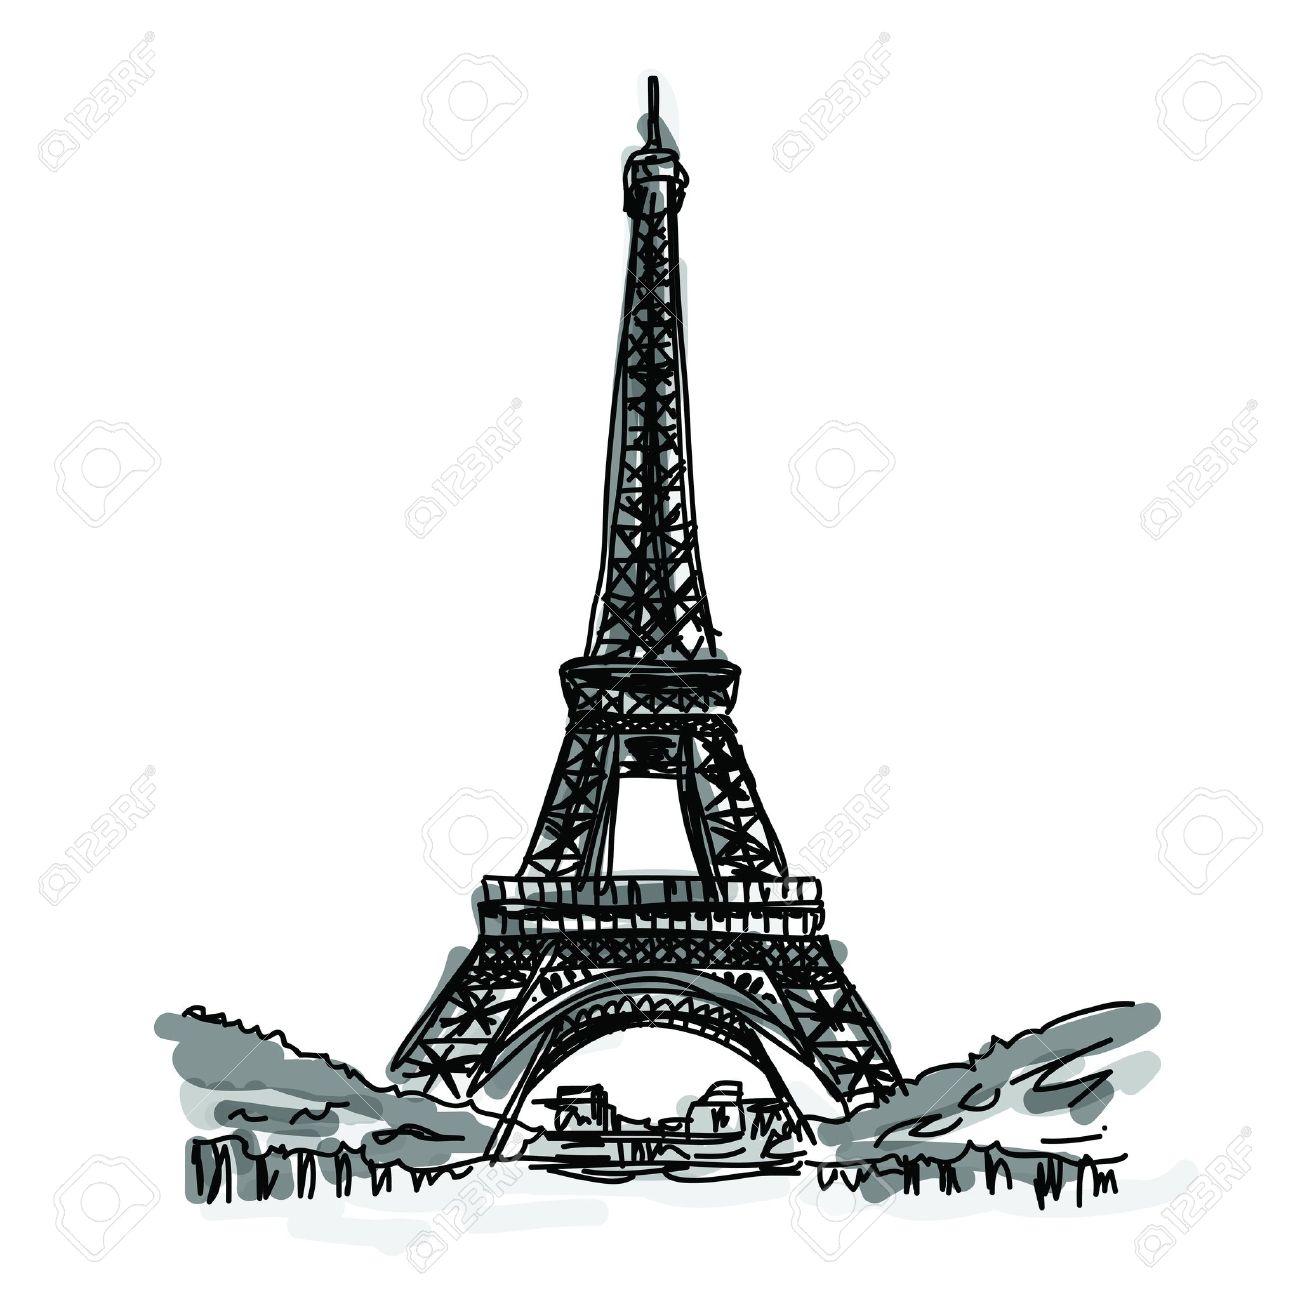 1300x1300 Drawn Eiffel Tower Famous Building